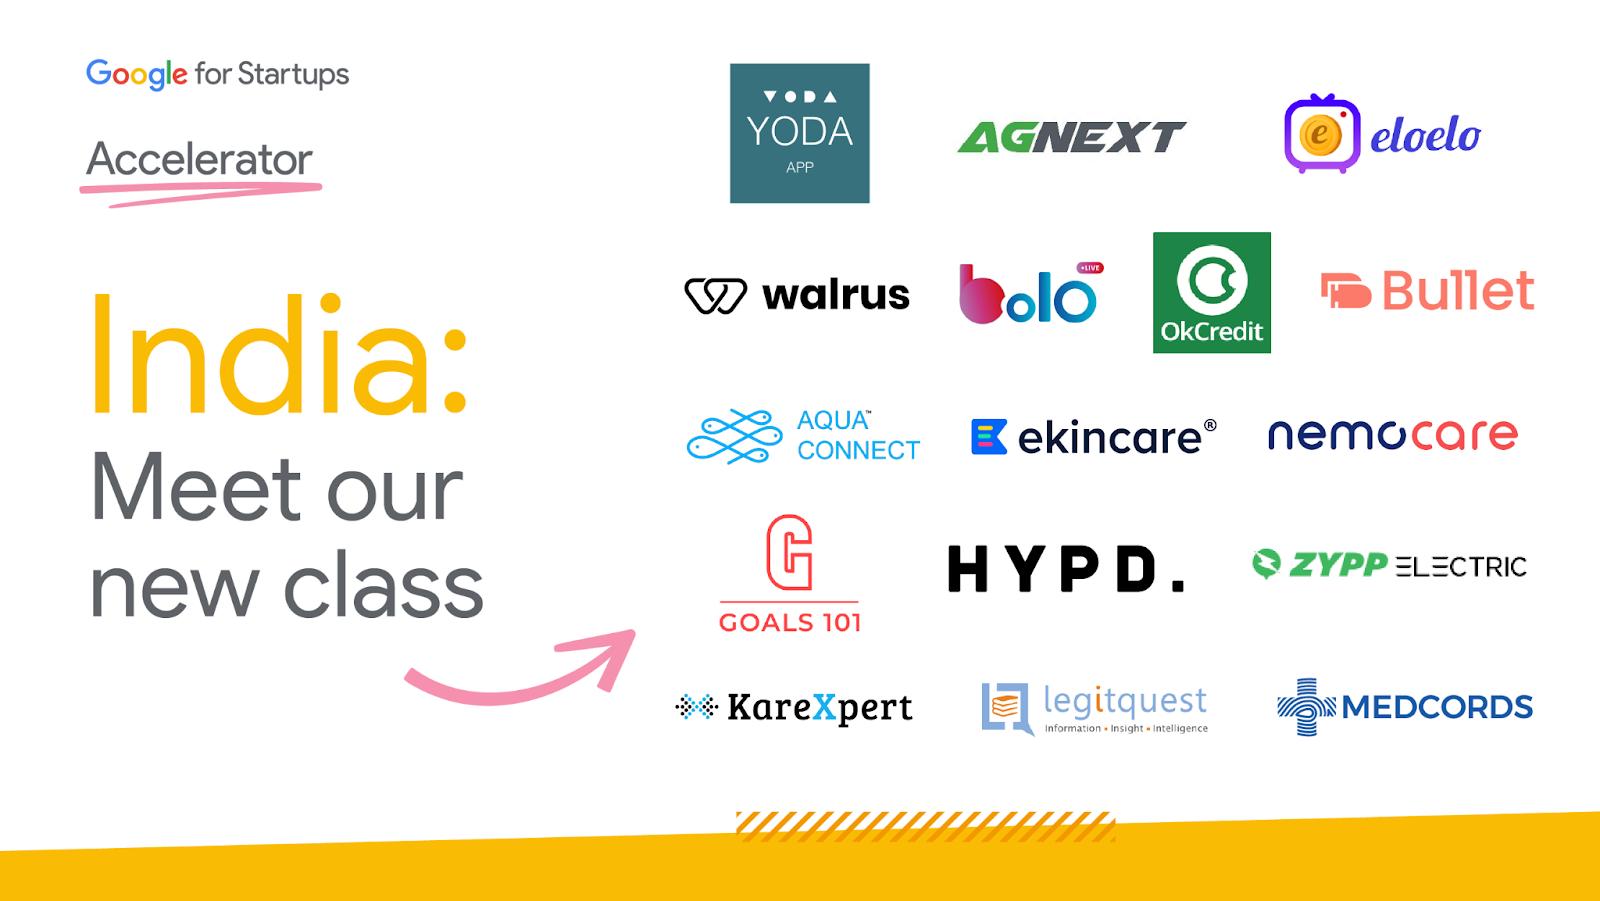 GFSA-India-class-announcement-Facebook-google-for-startups-india